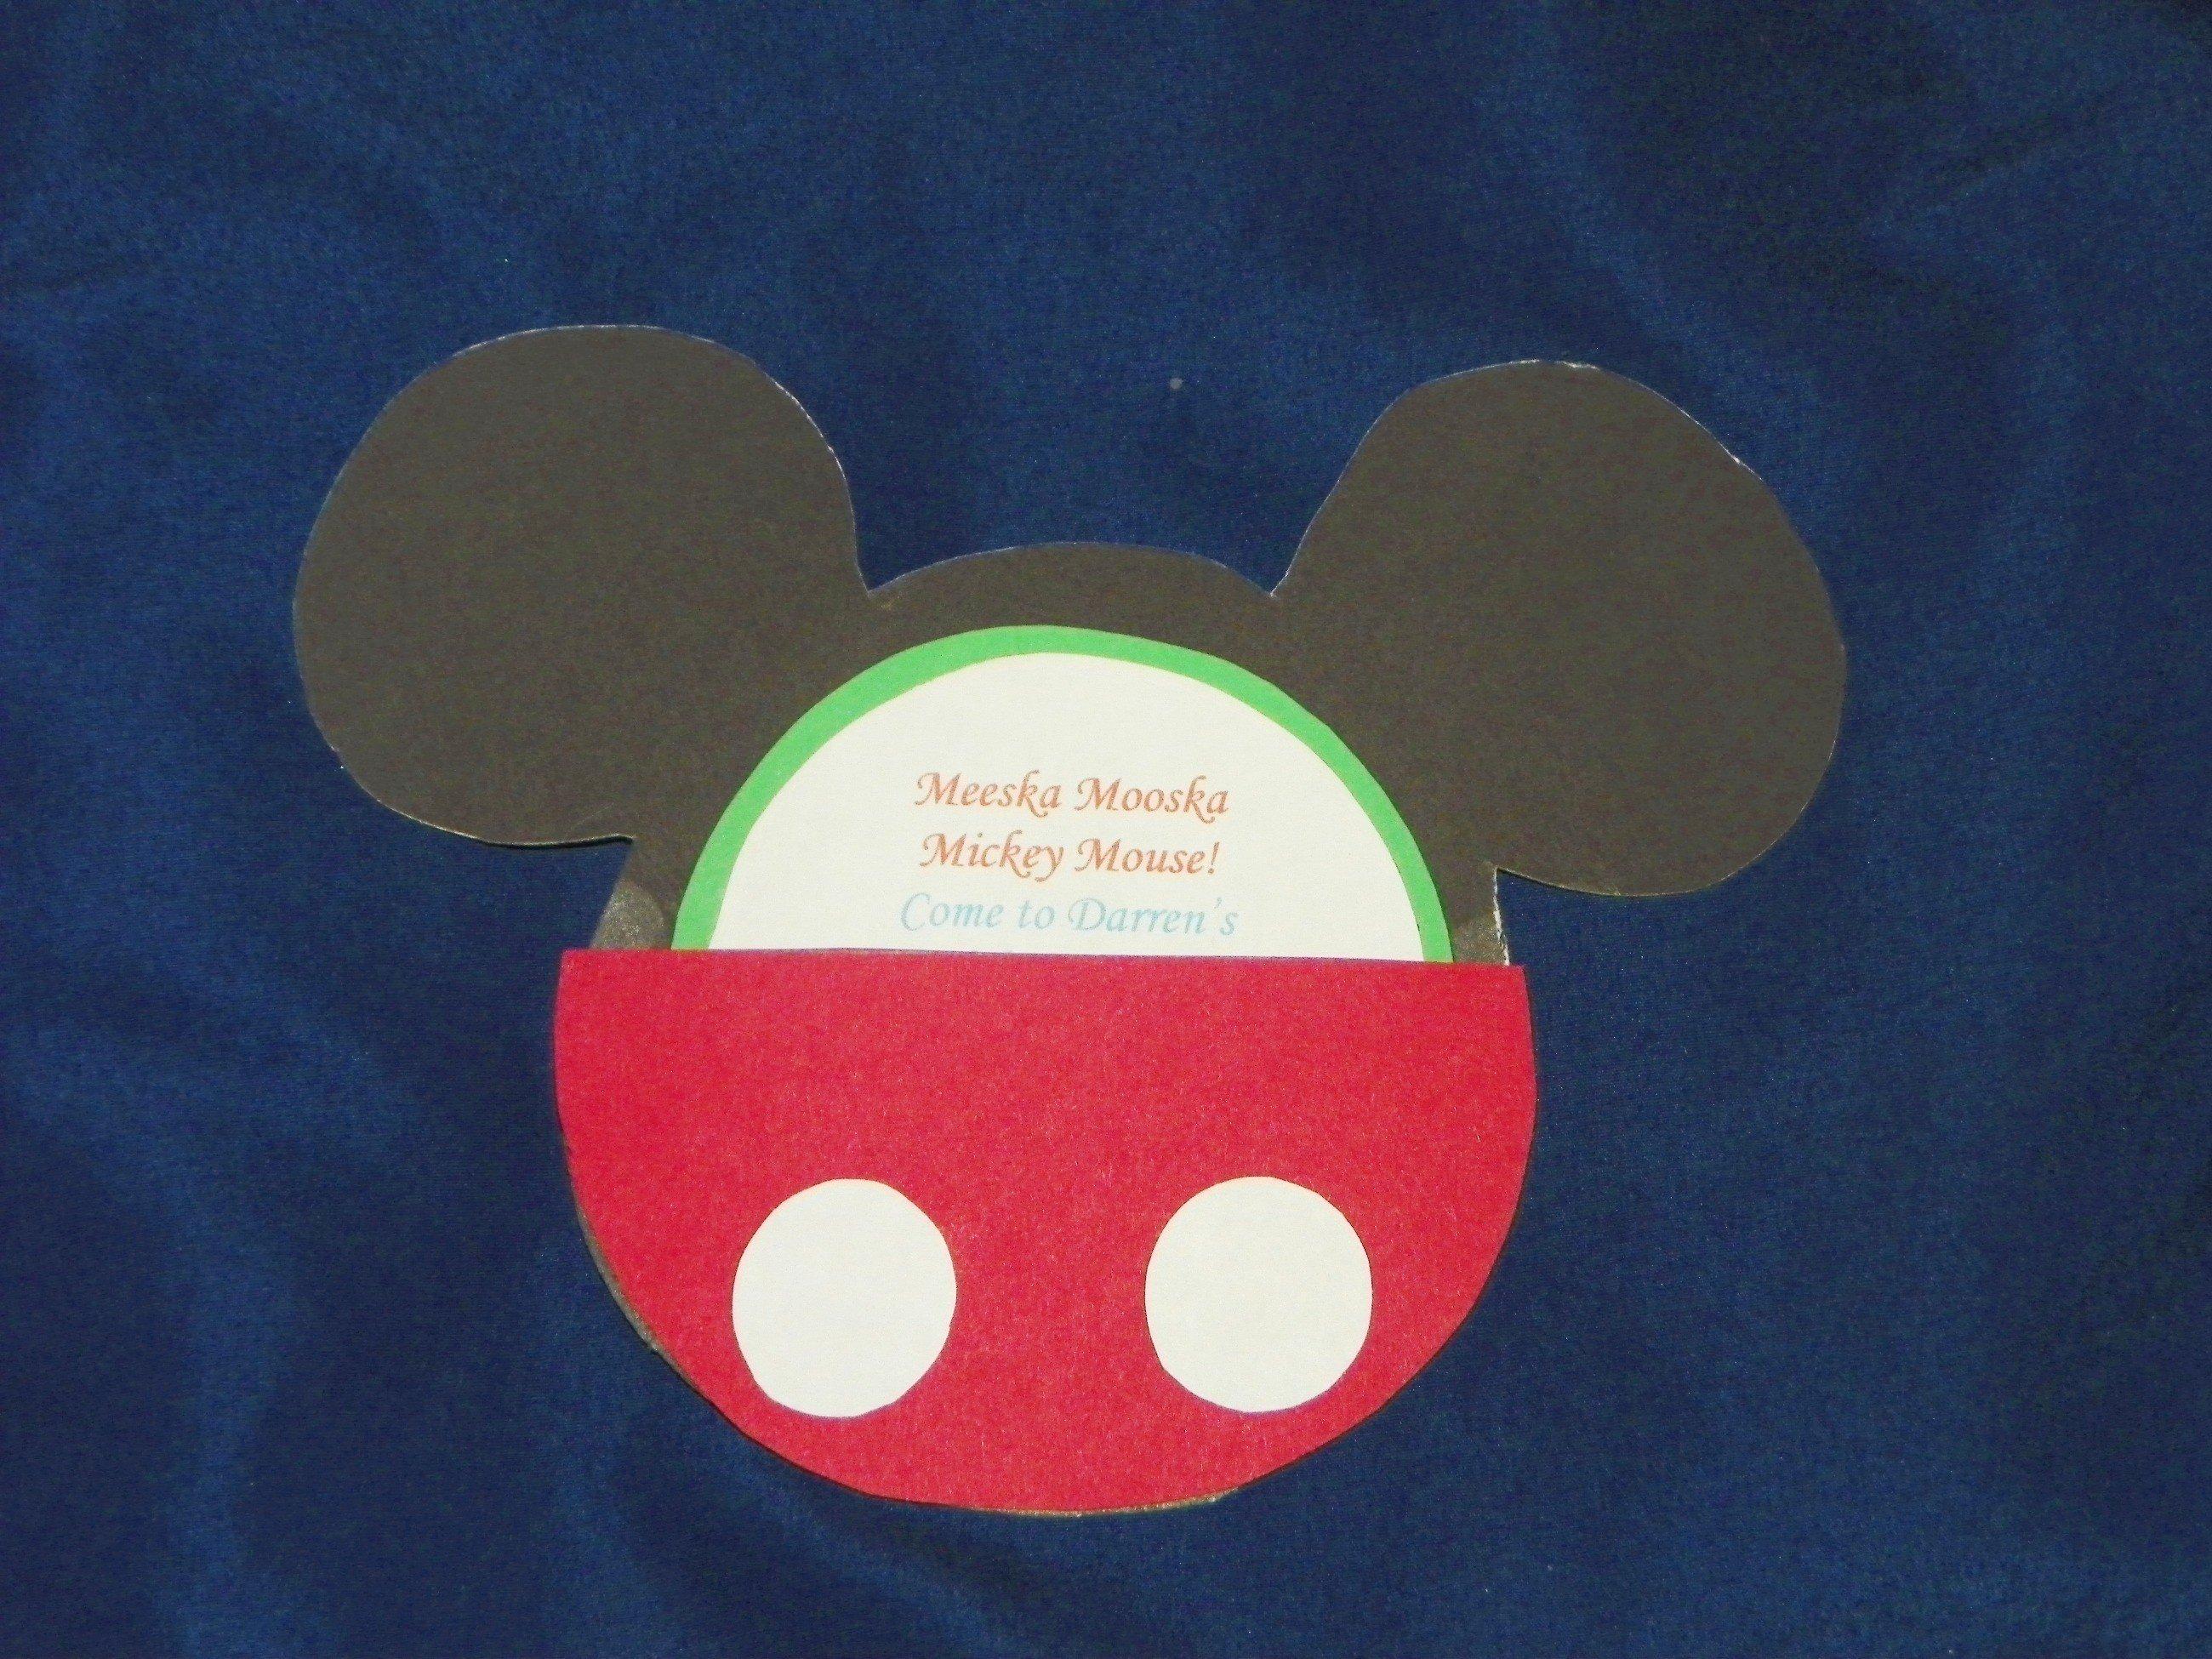 Mickey Mouse Invitation Maker Inspirational Mickey Mouse Invitations · How to Make An Invitation Card